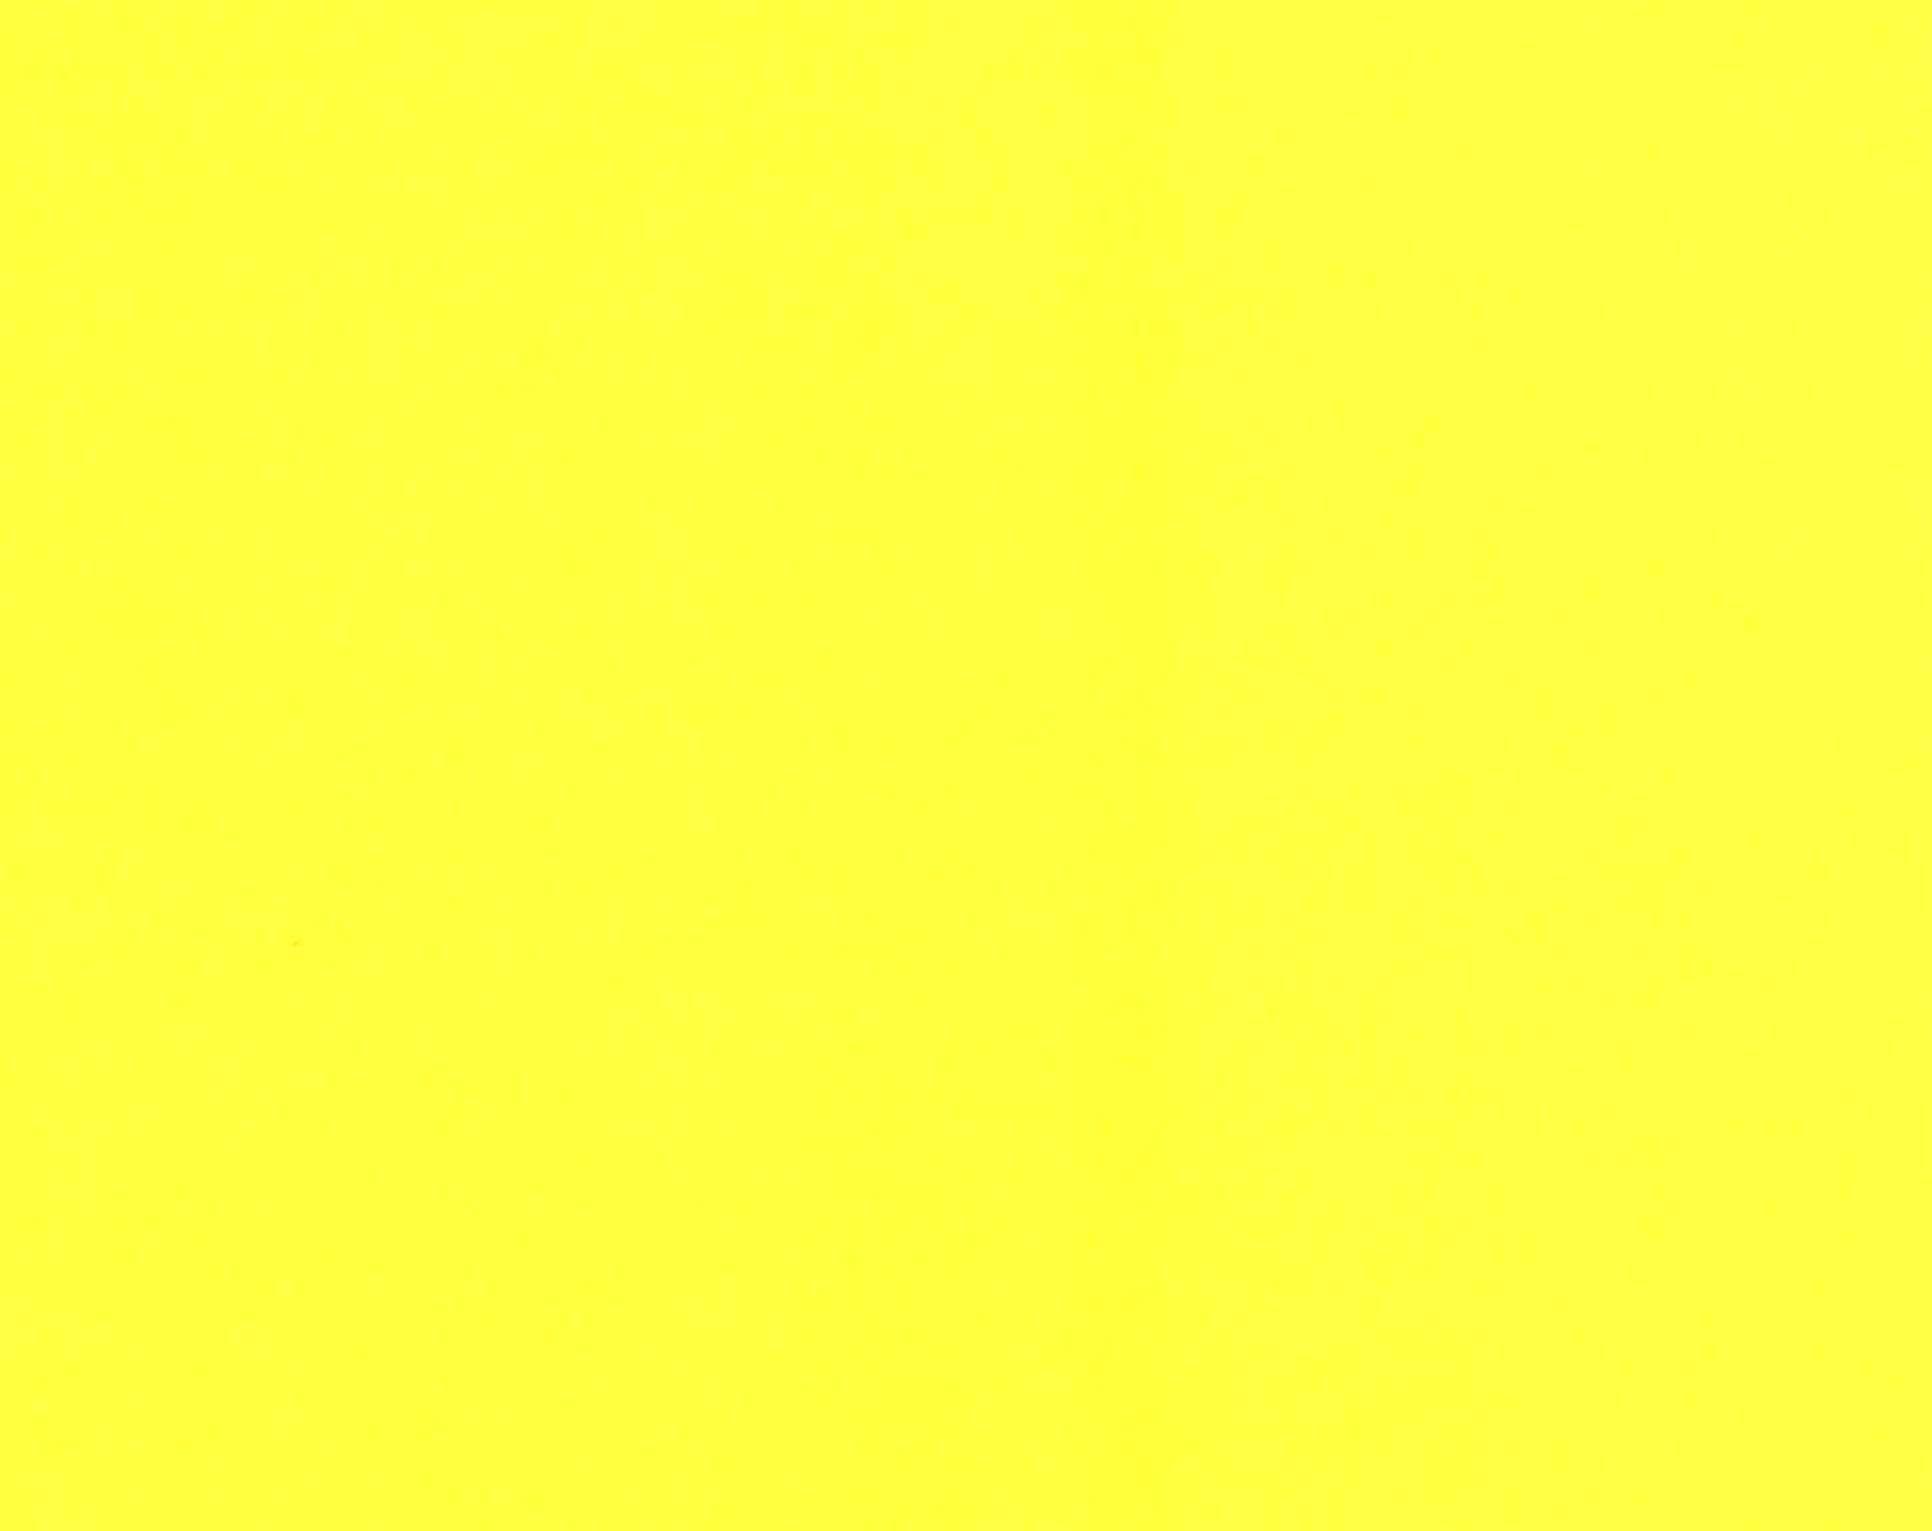 Wallpapers en color amarillo | Juliet | Pinterest